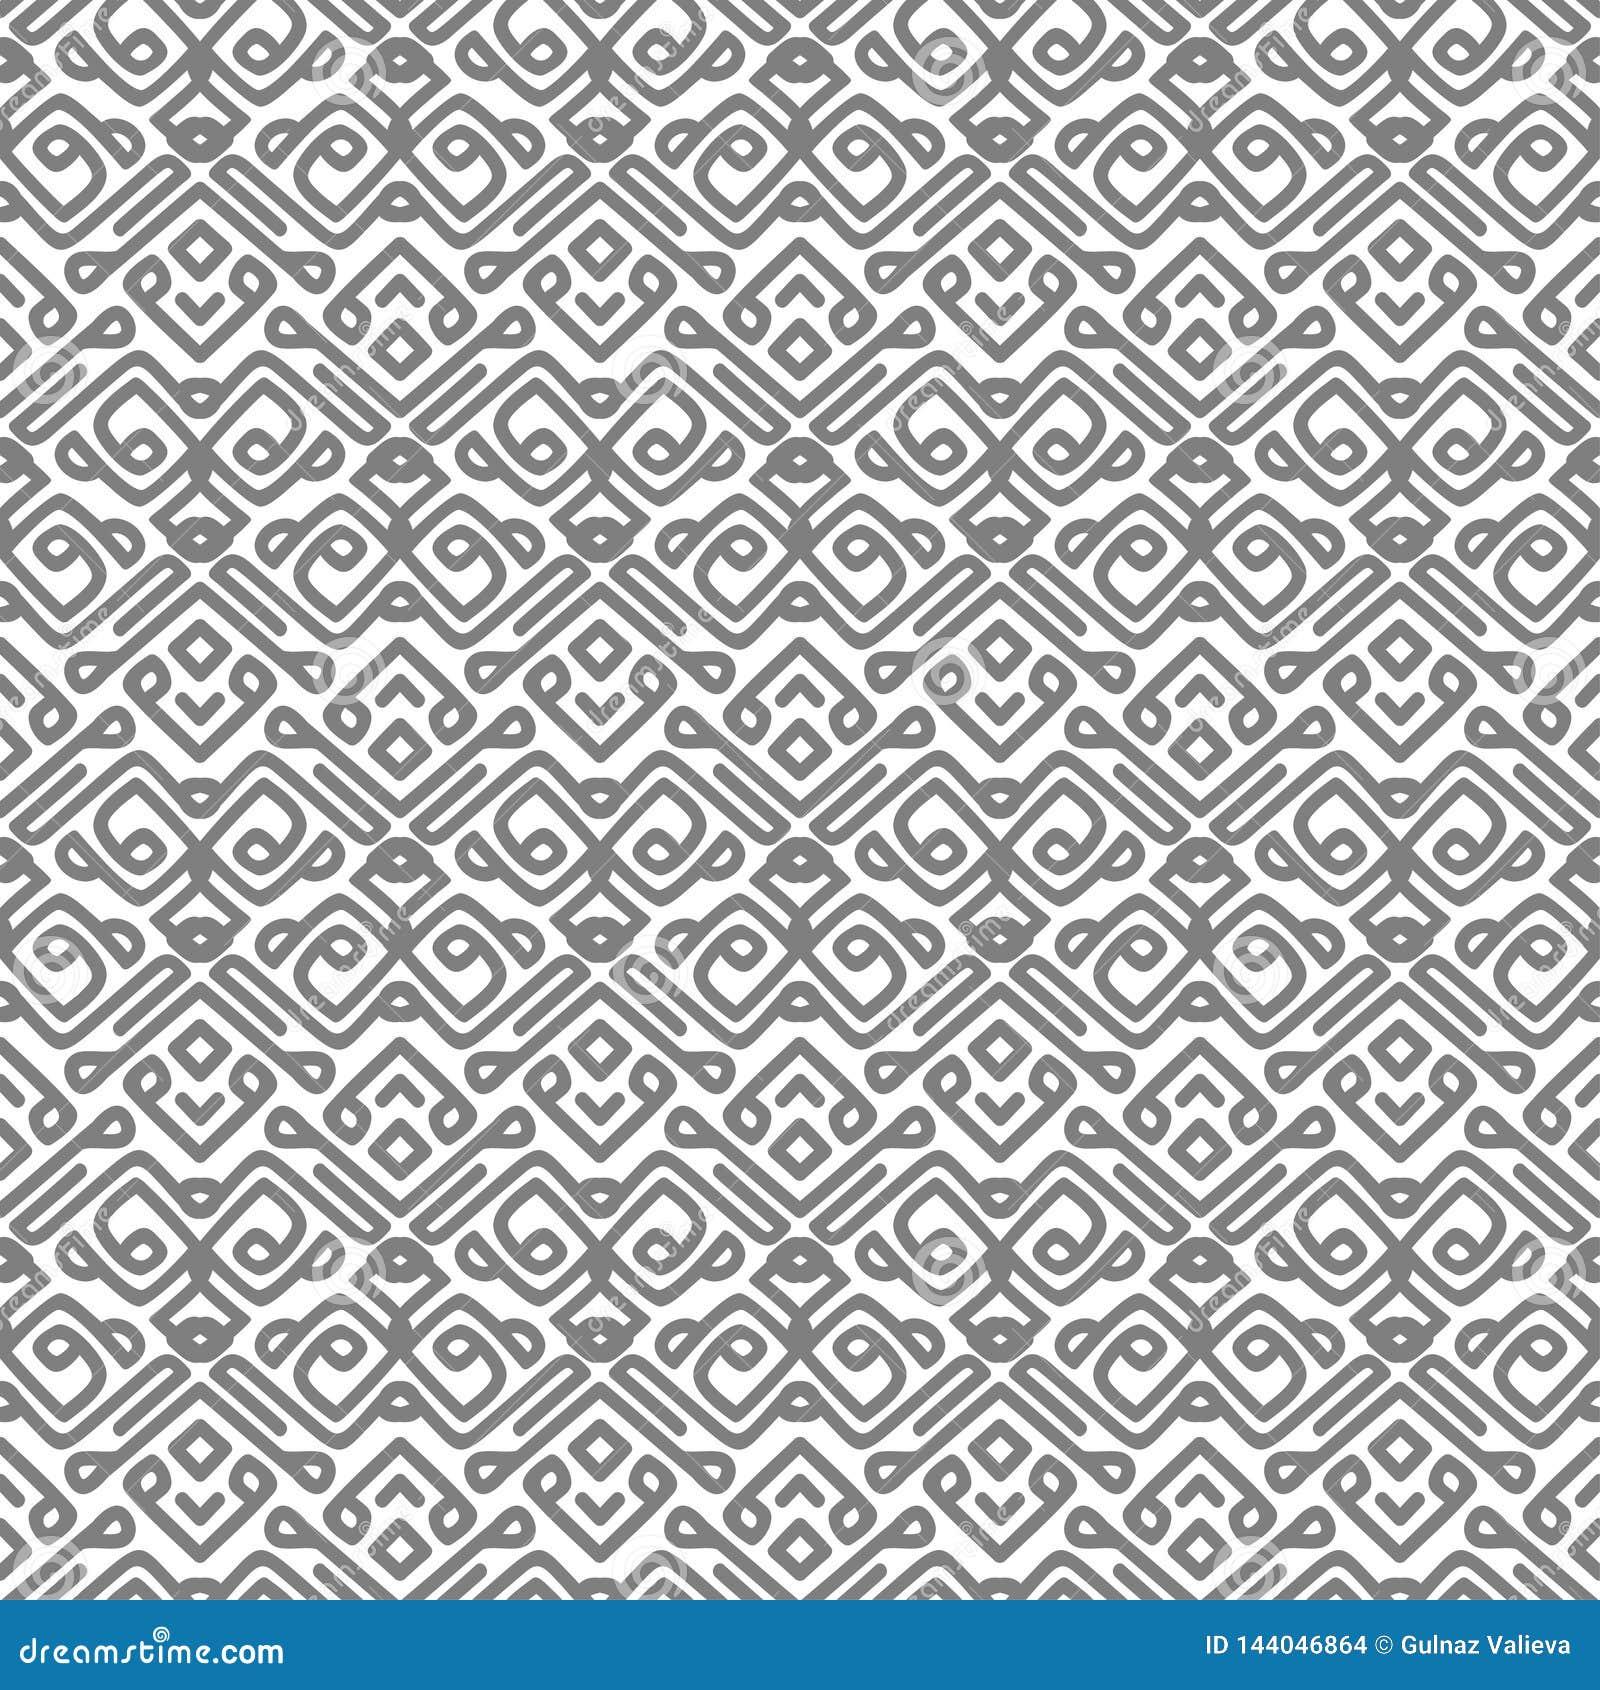 Vektormuster mit grauen glatten Linien